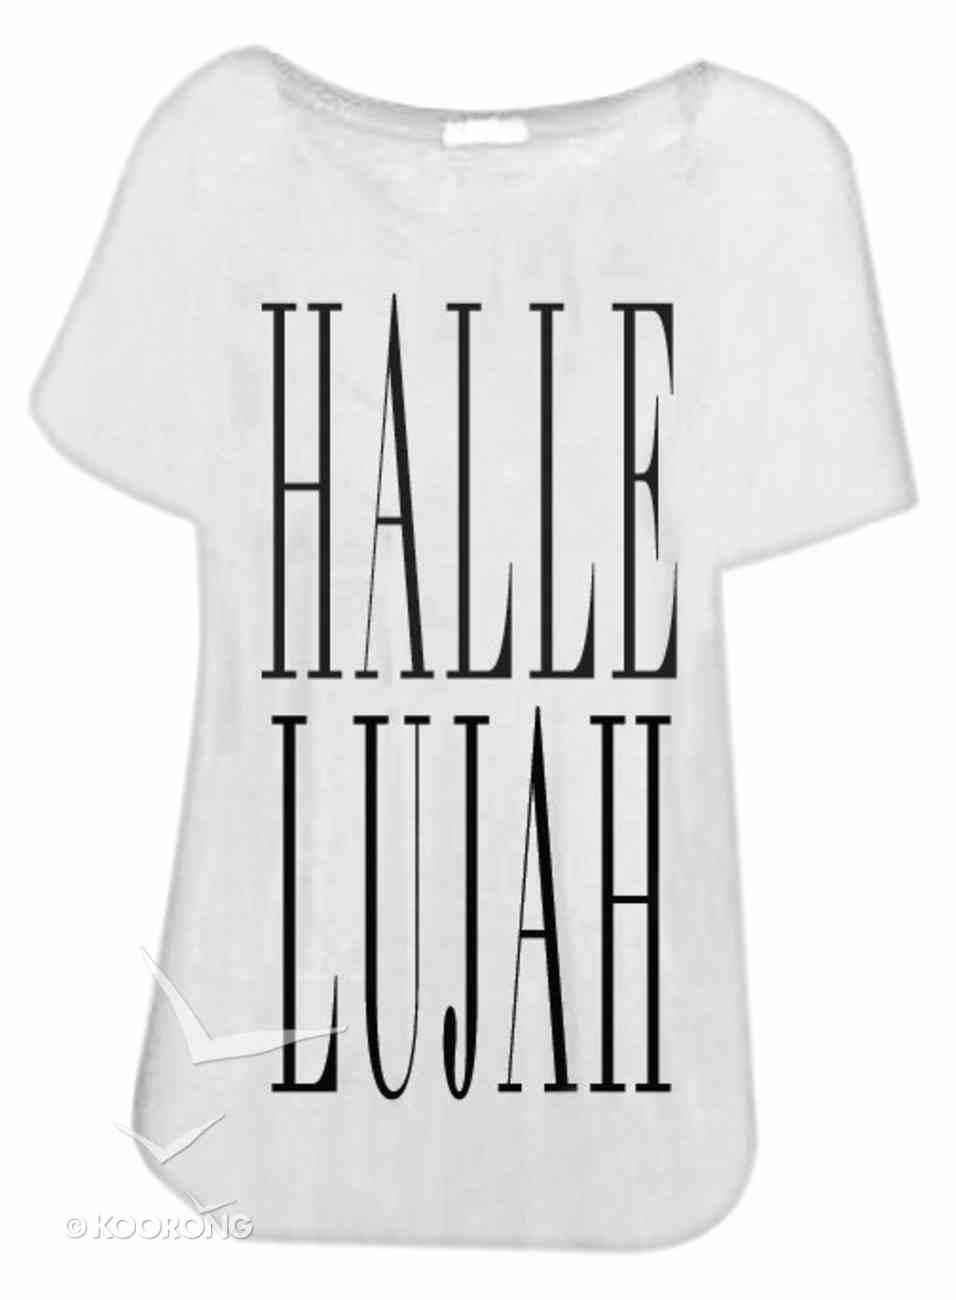 T-Shirt: Hallelujah Extra Small White/Black Writing Soft Goods